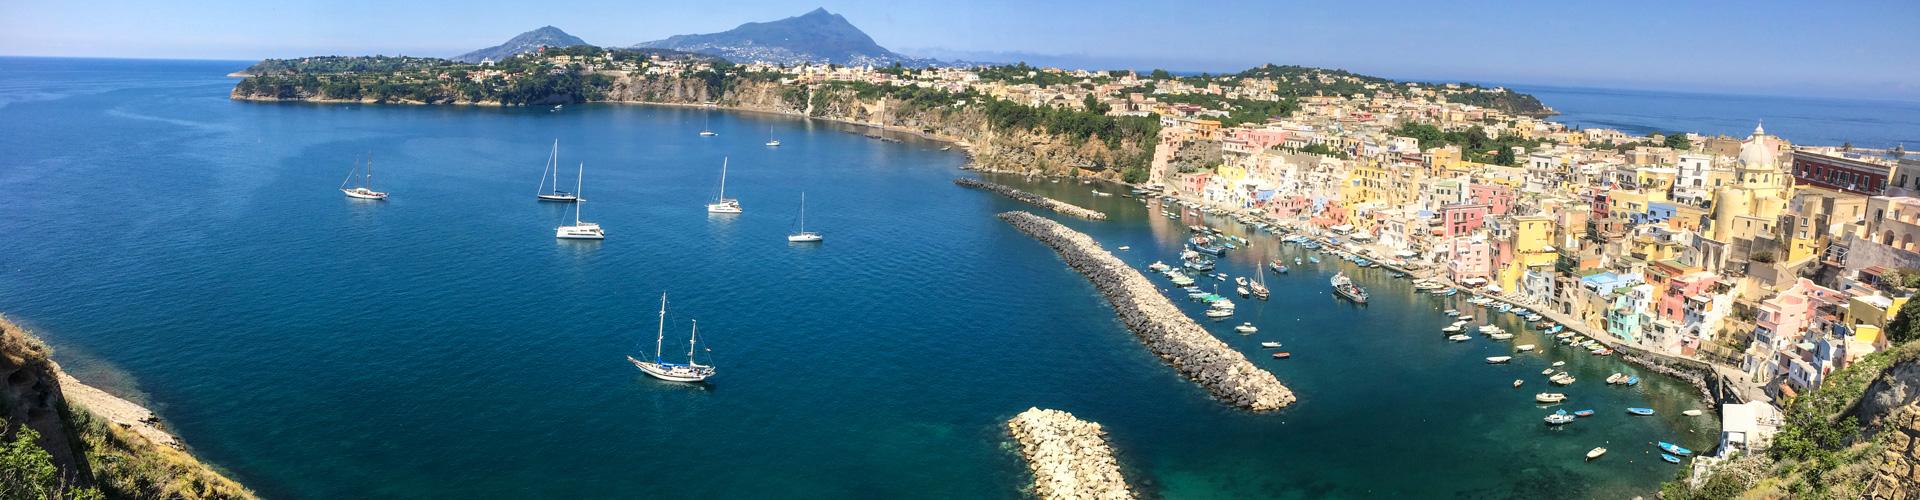 Sail Italy – Procida to Amalfi